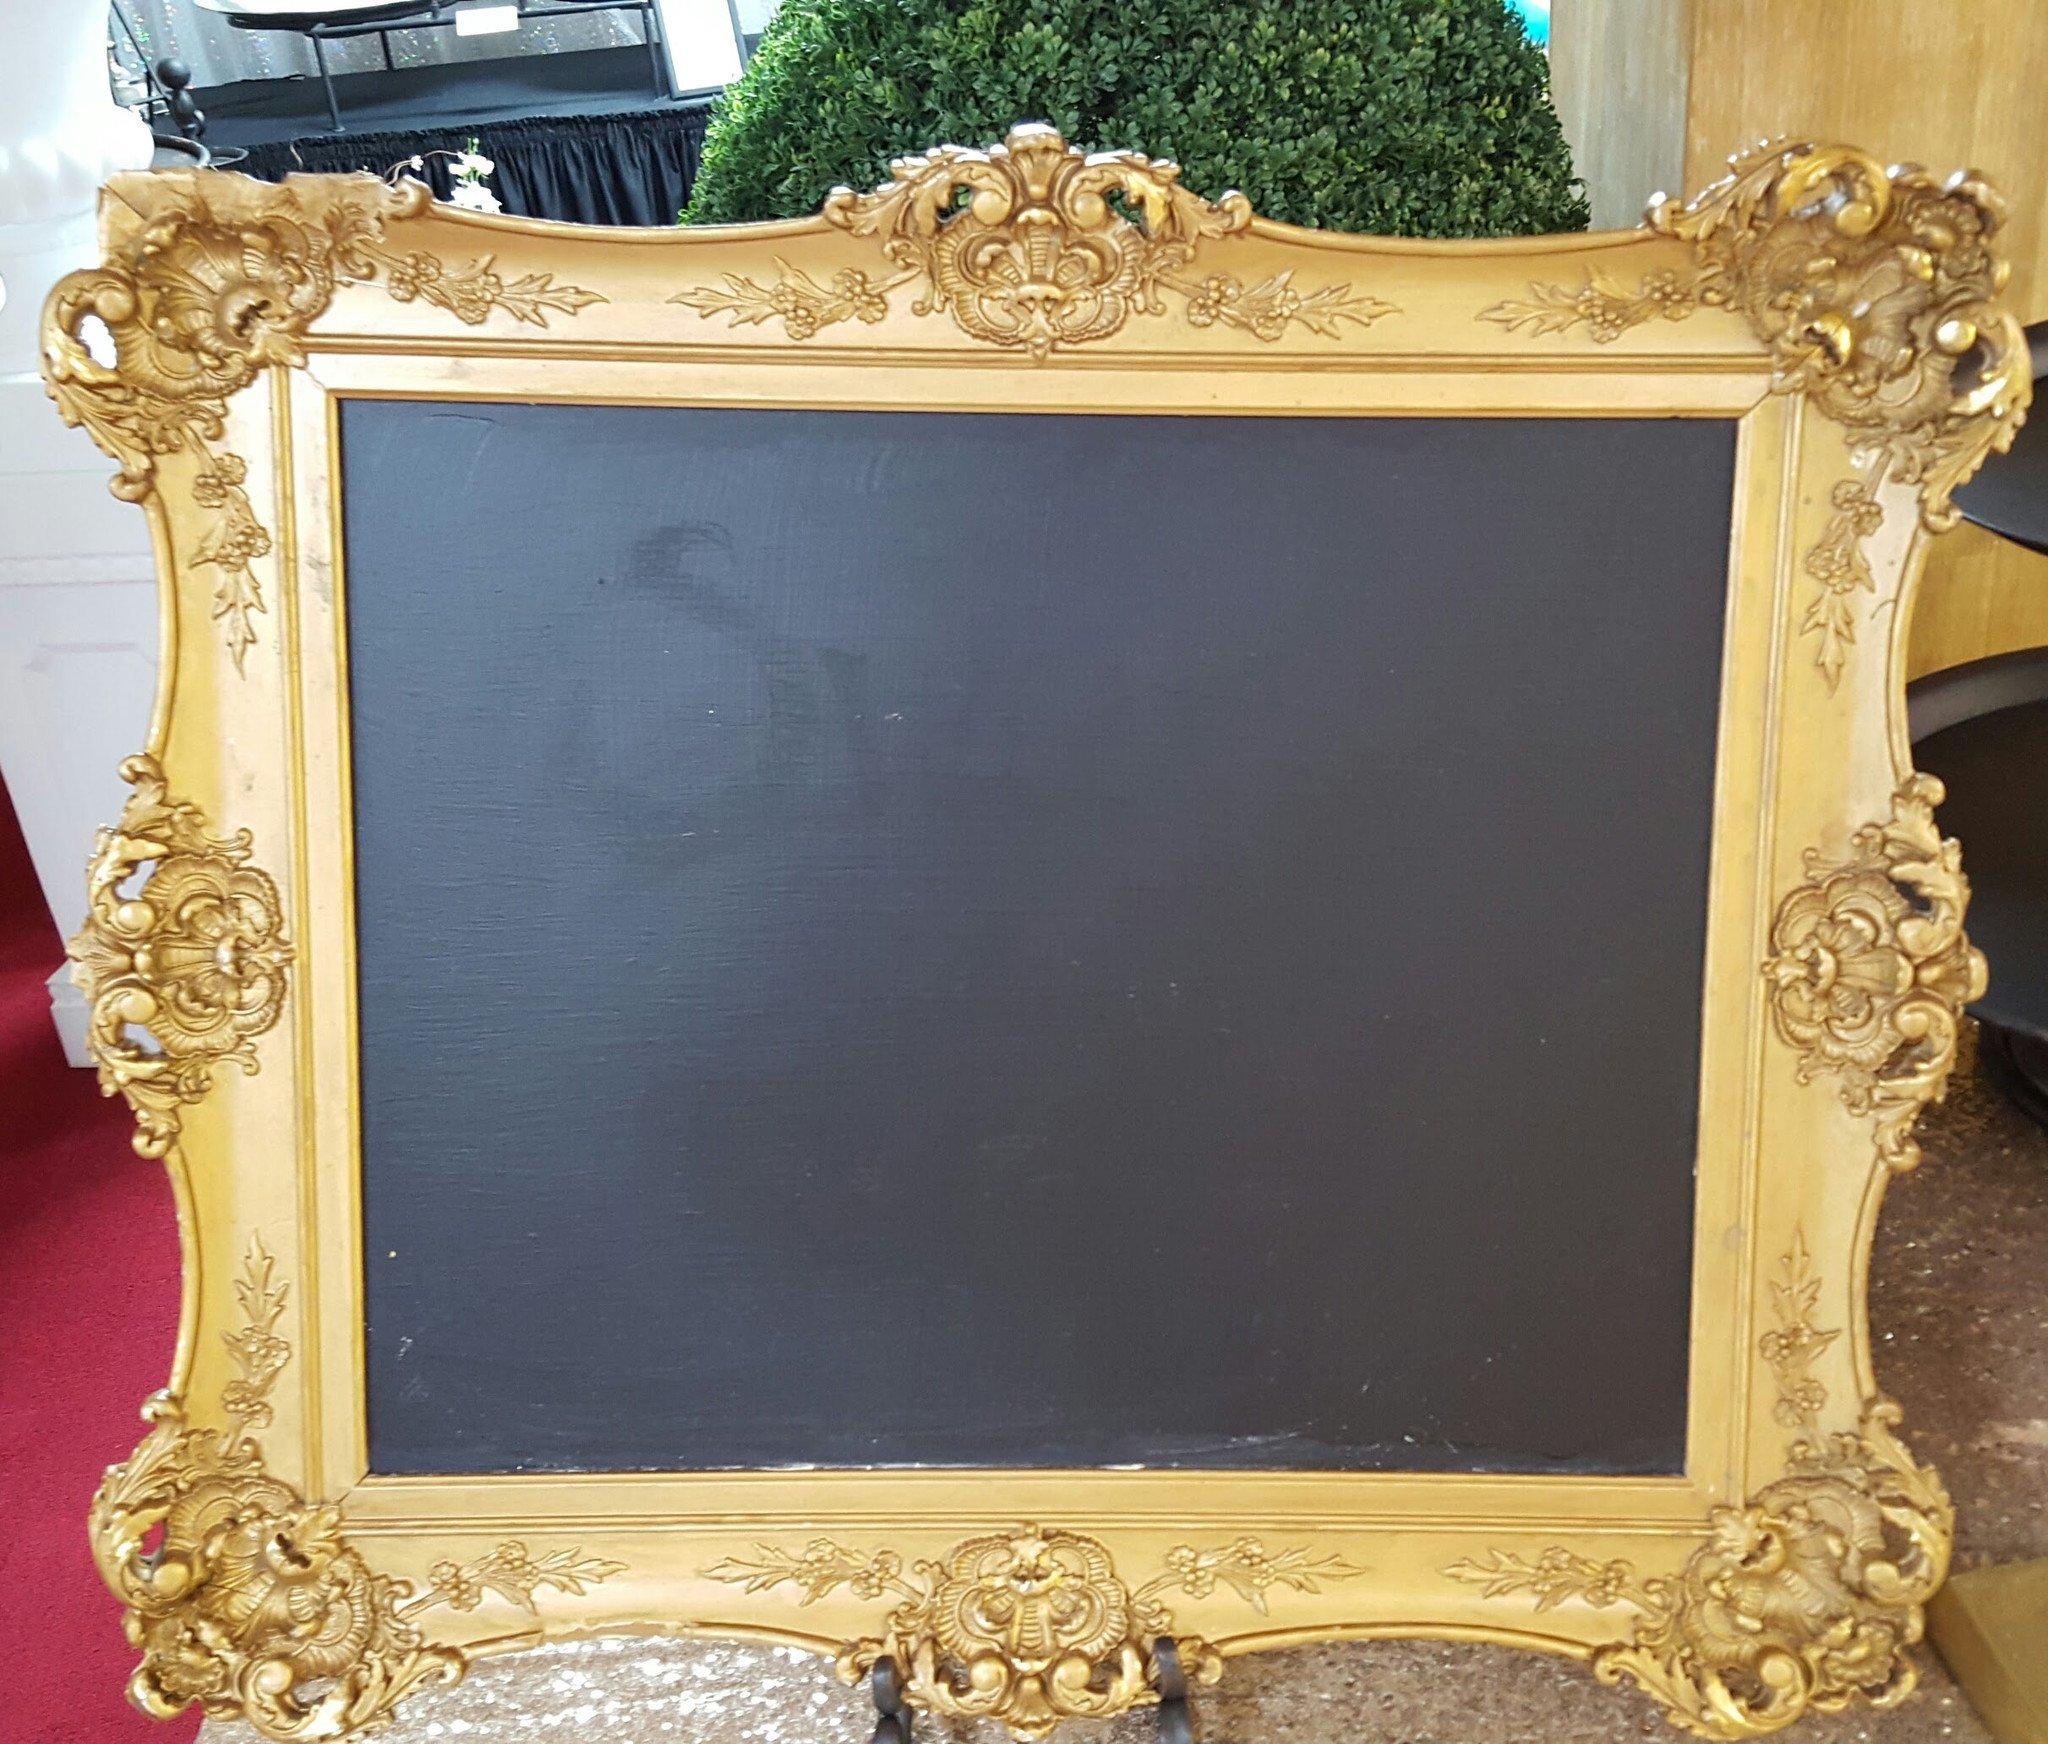 Small Gold Chalkboard Image